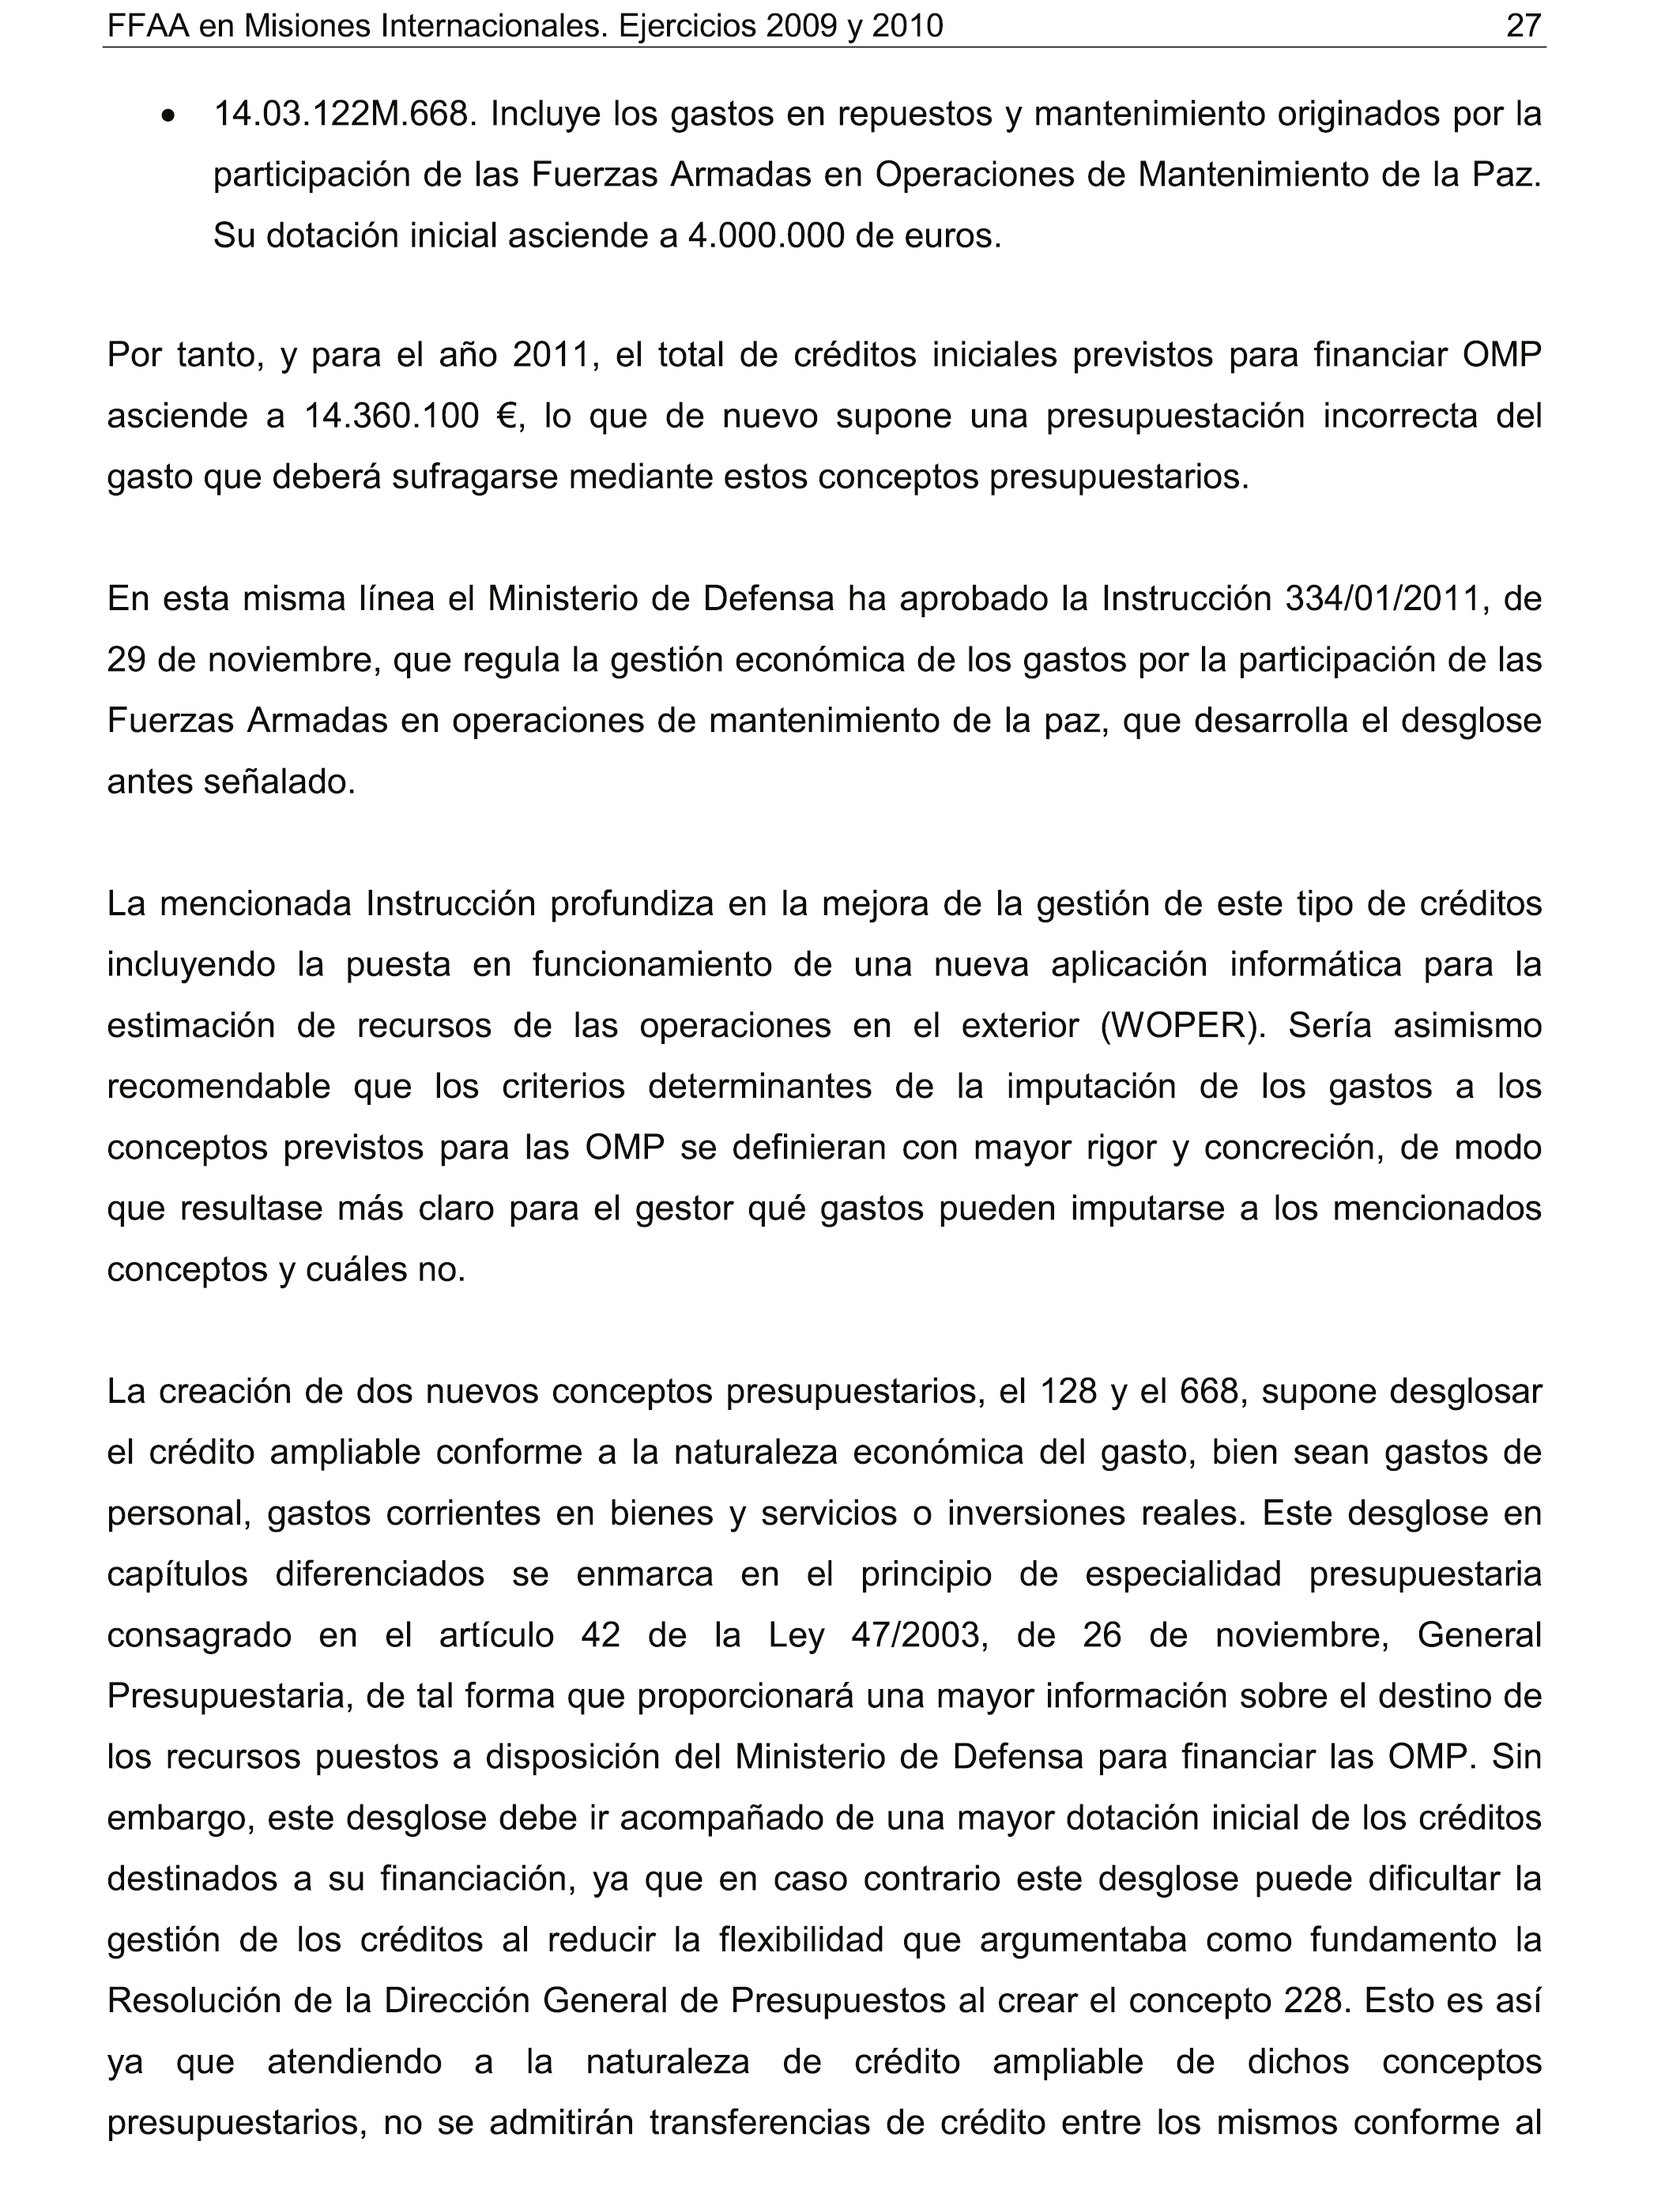 BOE.es - Documento BOE-A-2017-7191